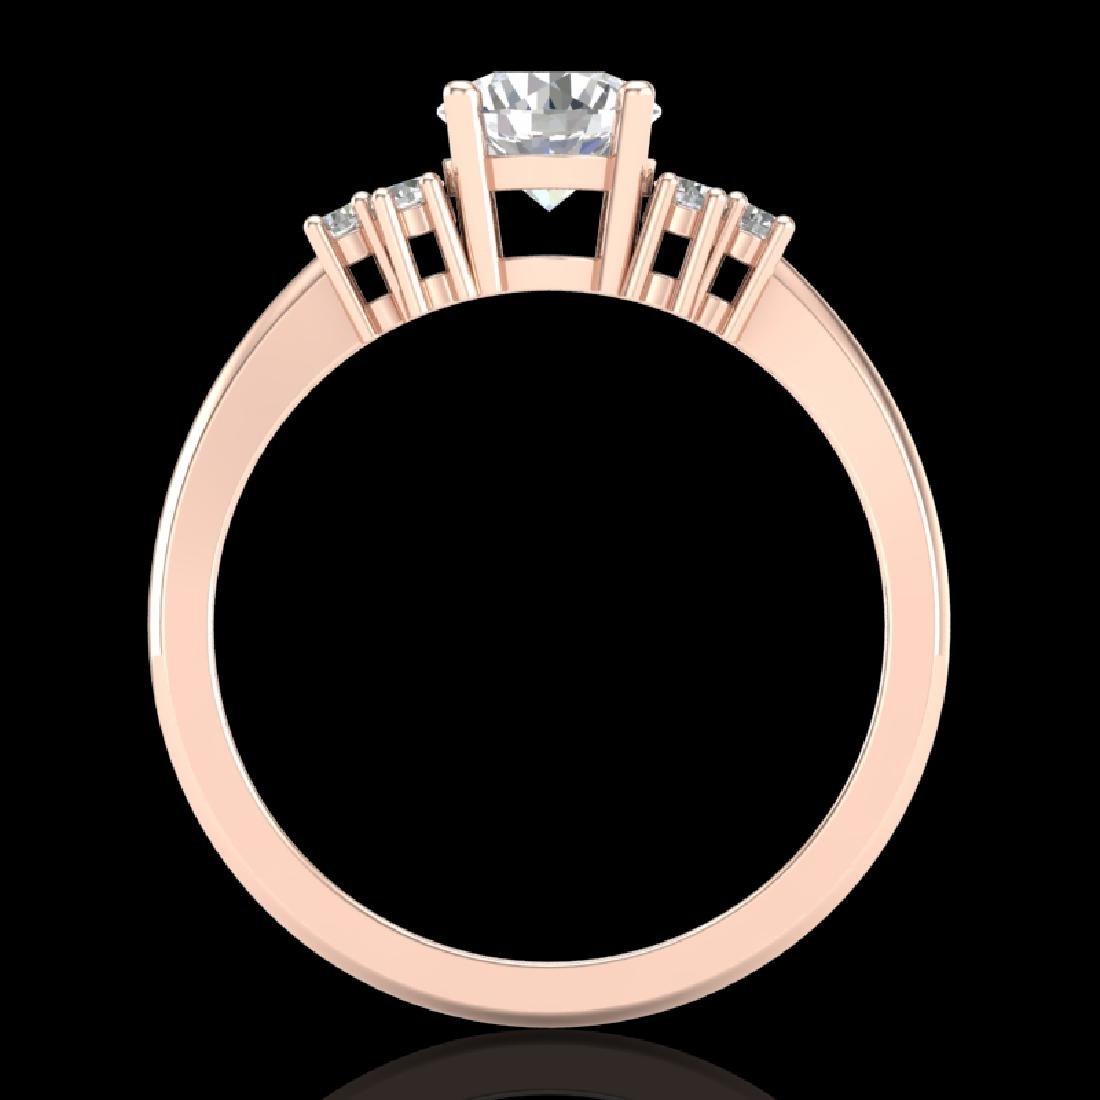 1 CTW VS/SI Diamond Ring Size 7 18K Rose Gold - 2